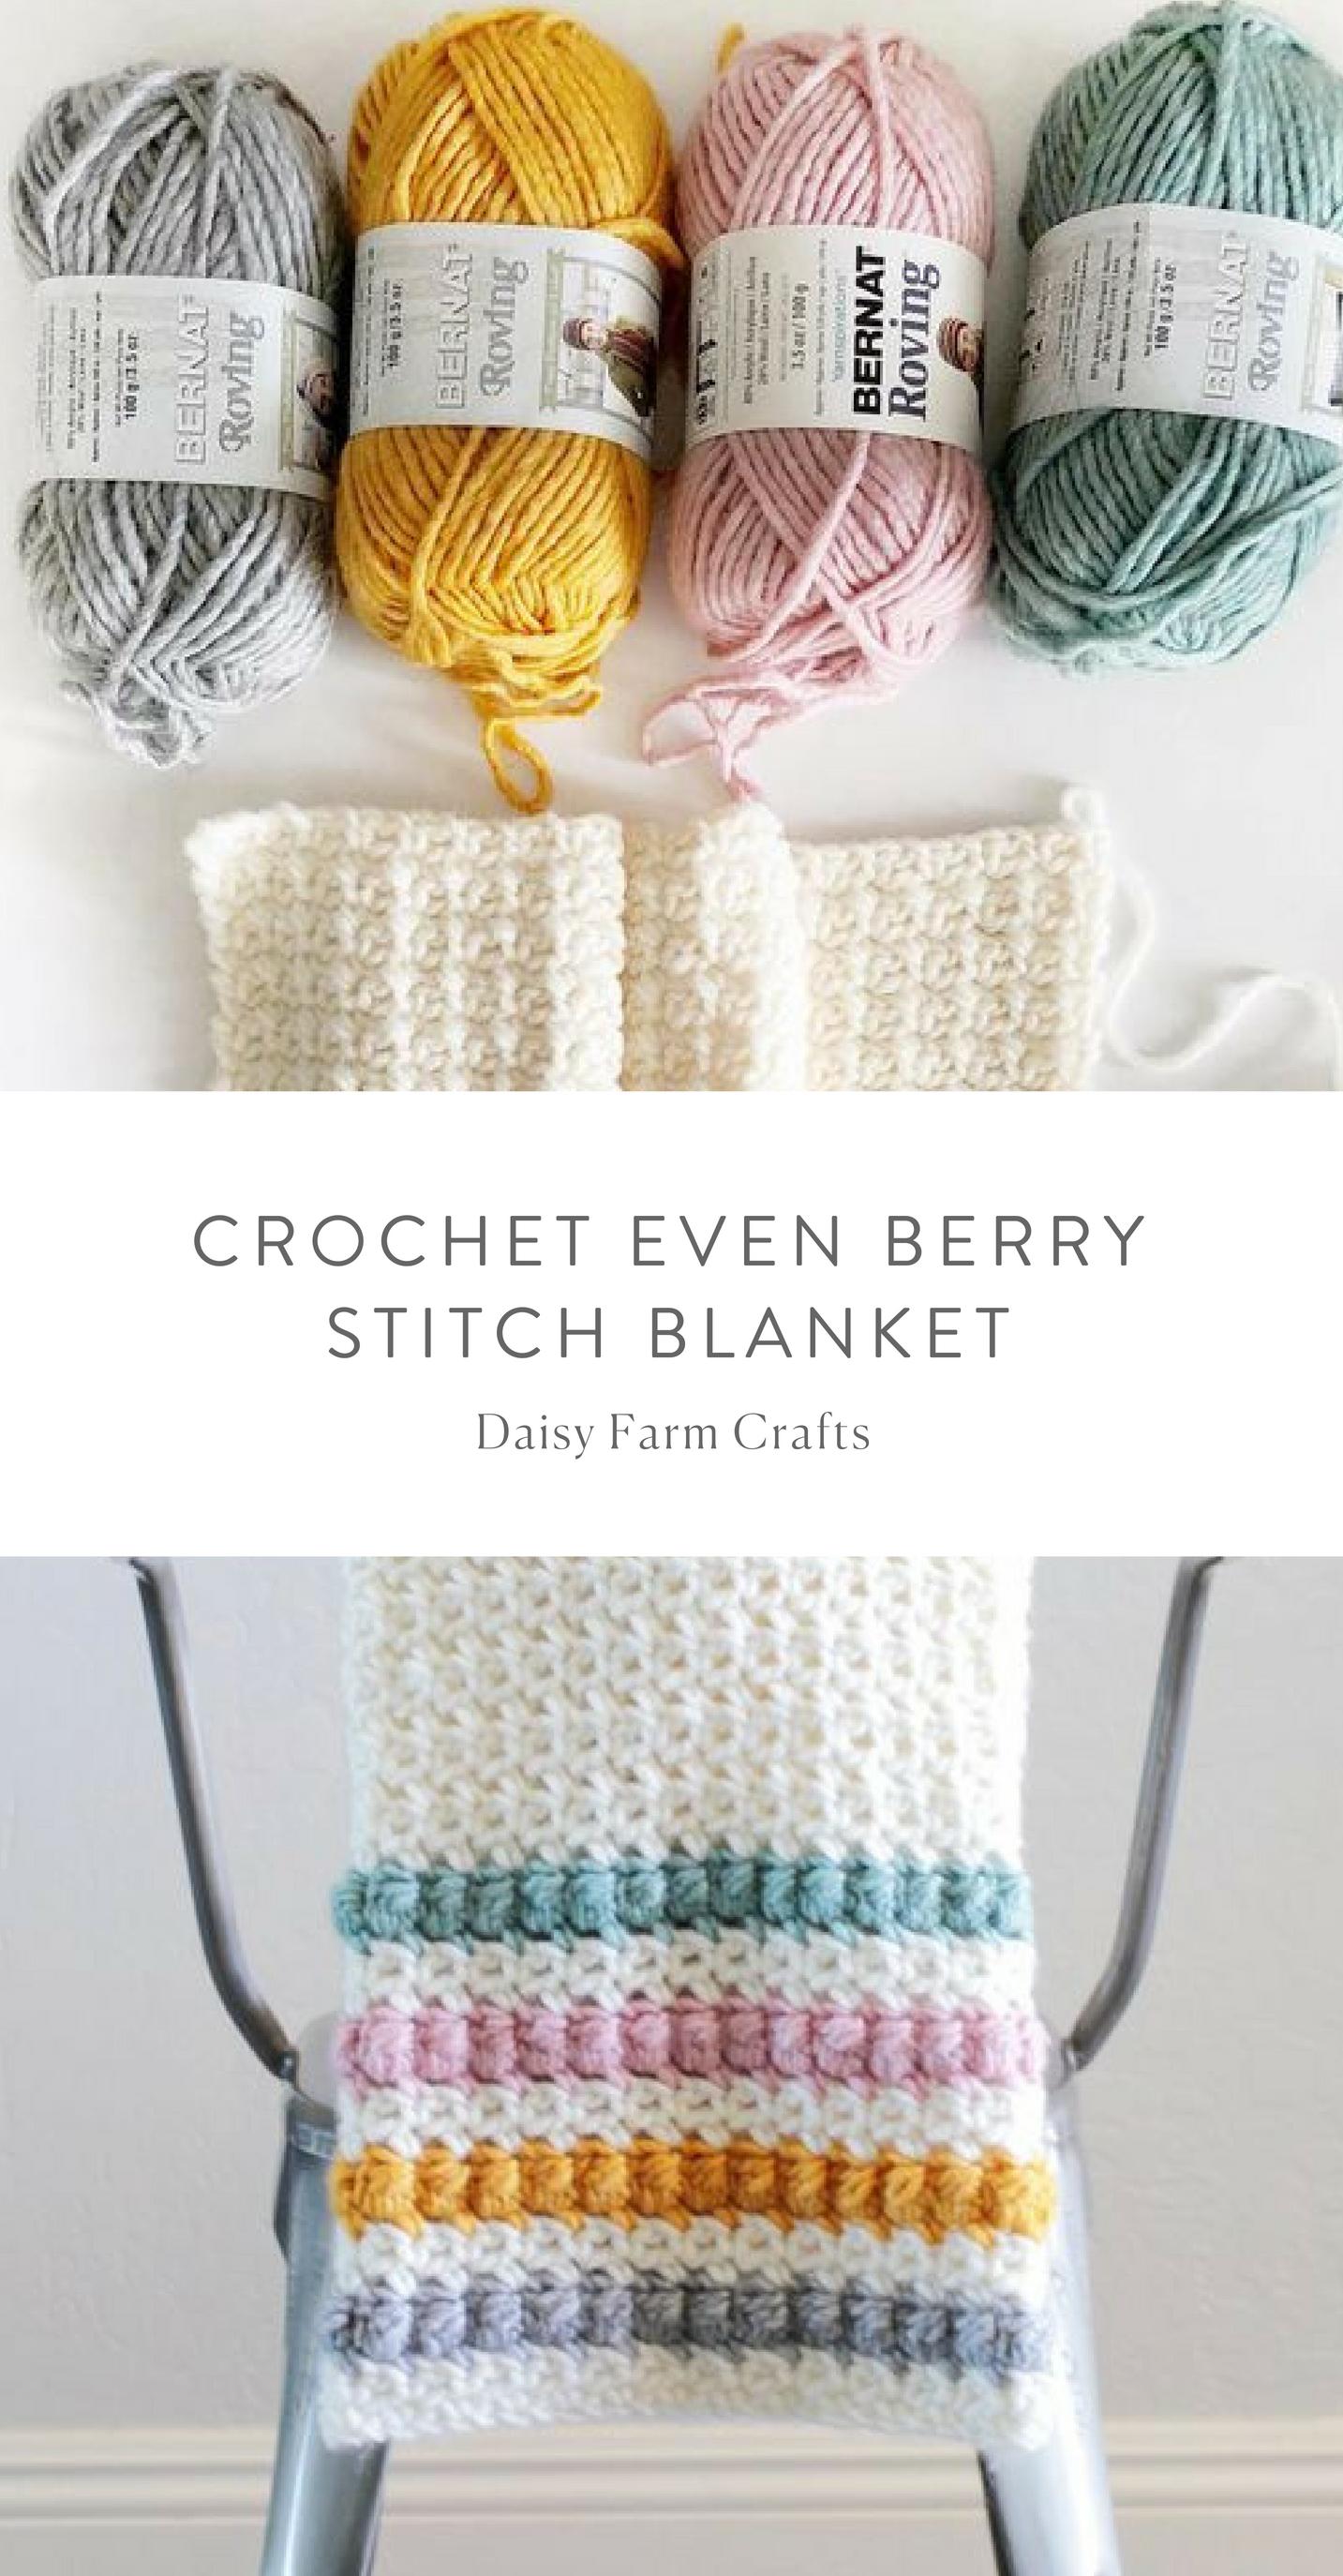 Free Pattern - Crochet Even Berry Stitch Blanket #crochet | Knits ...